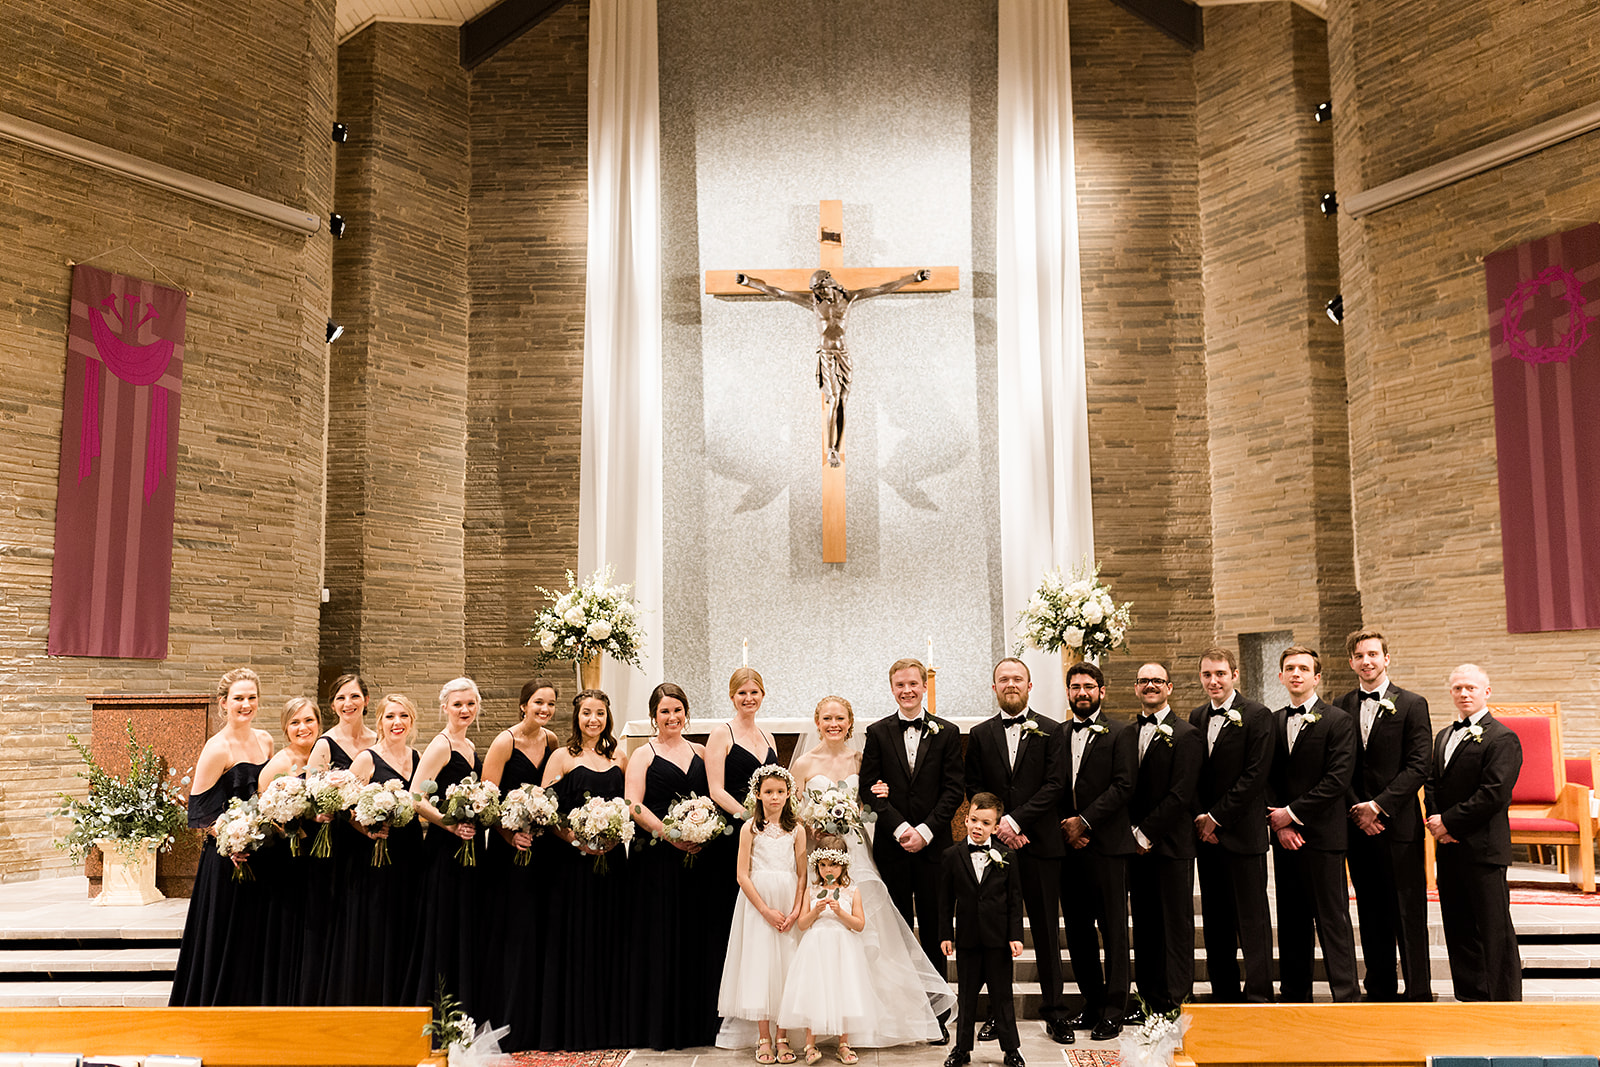 Katie_Will_Wedding_BrookeTaelor-418.jpg